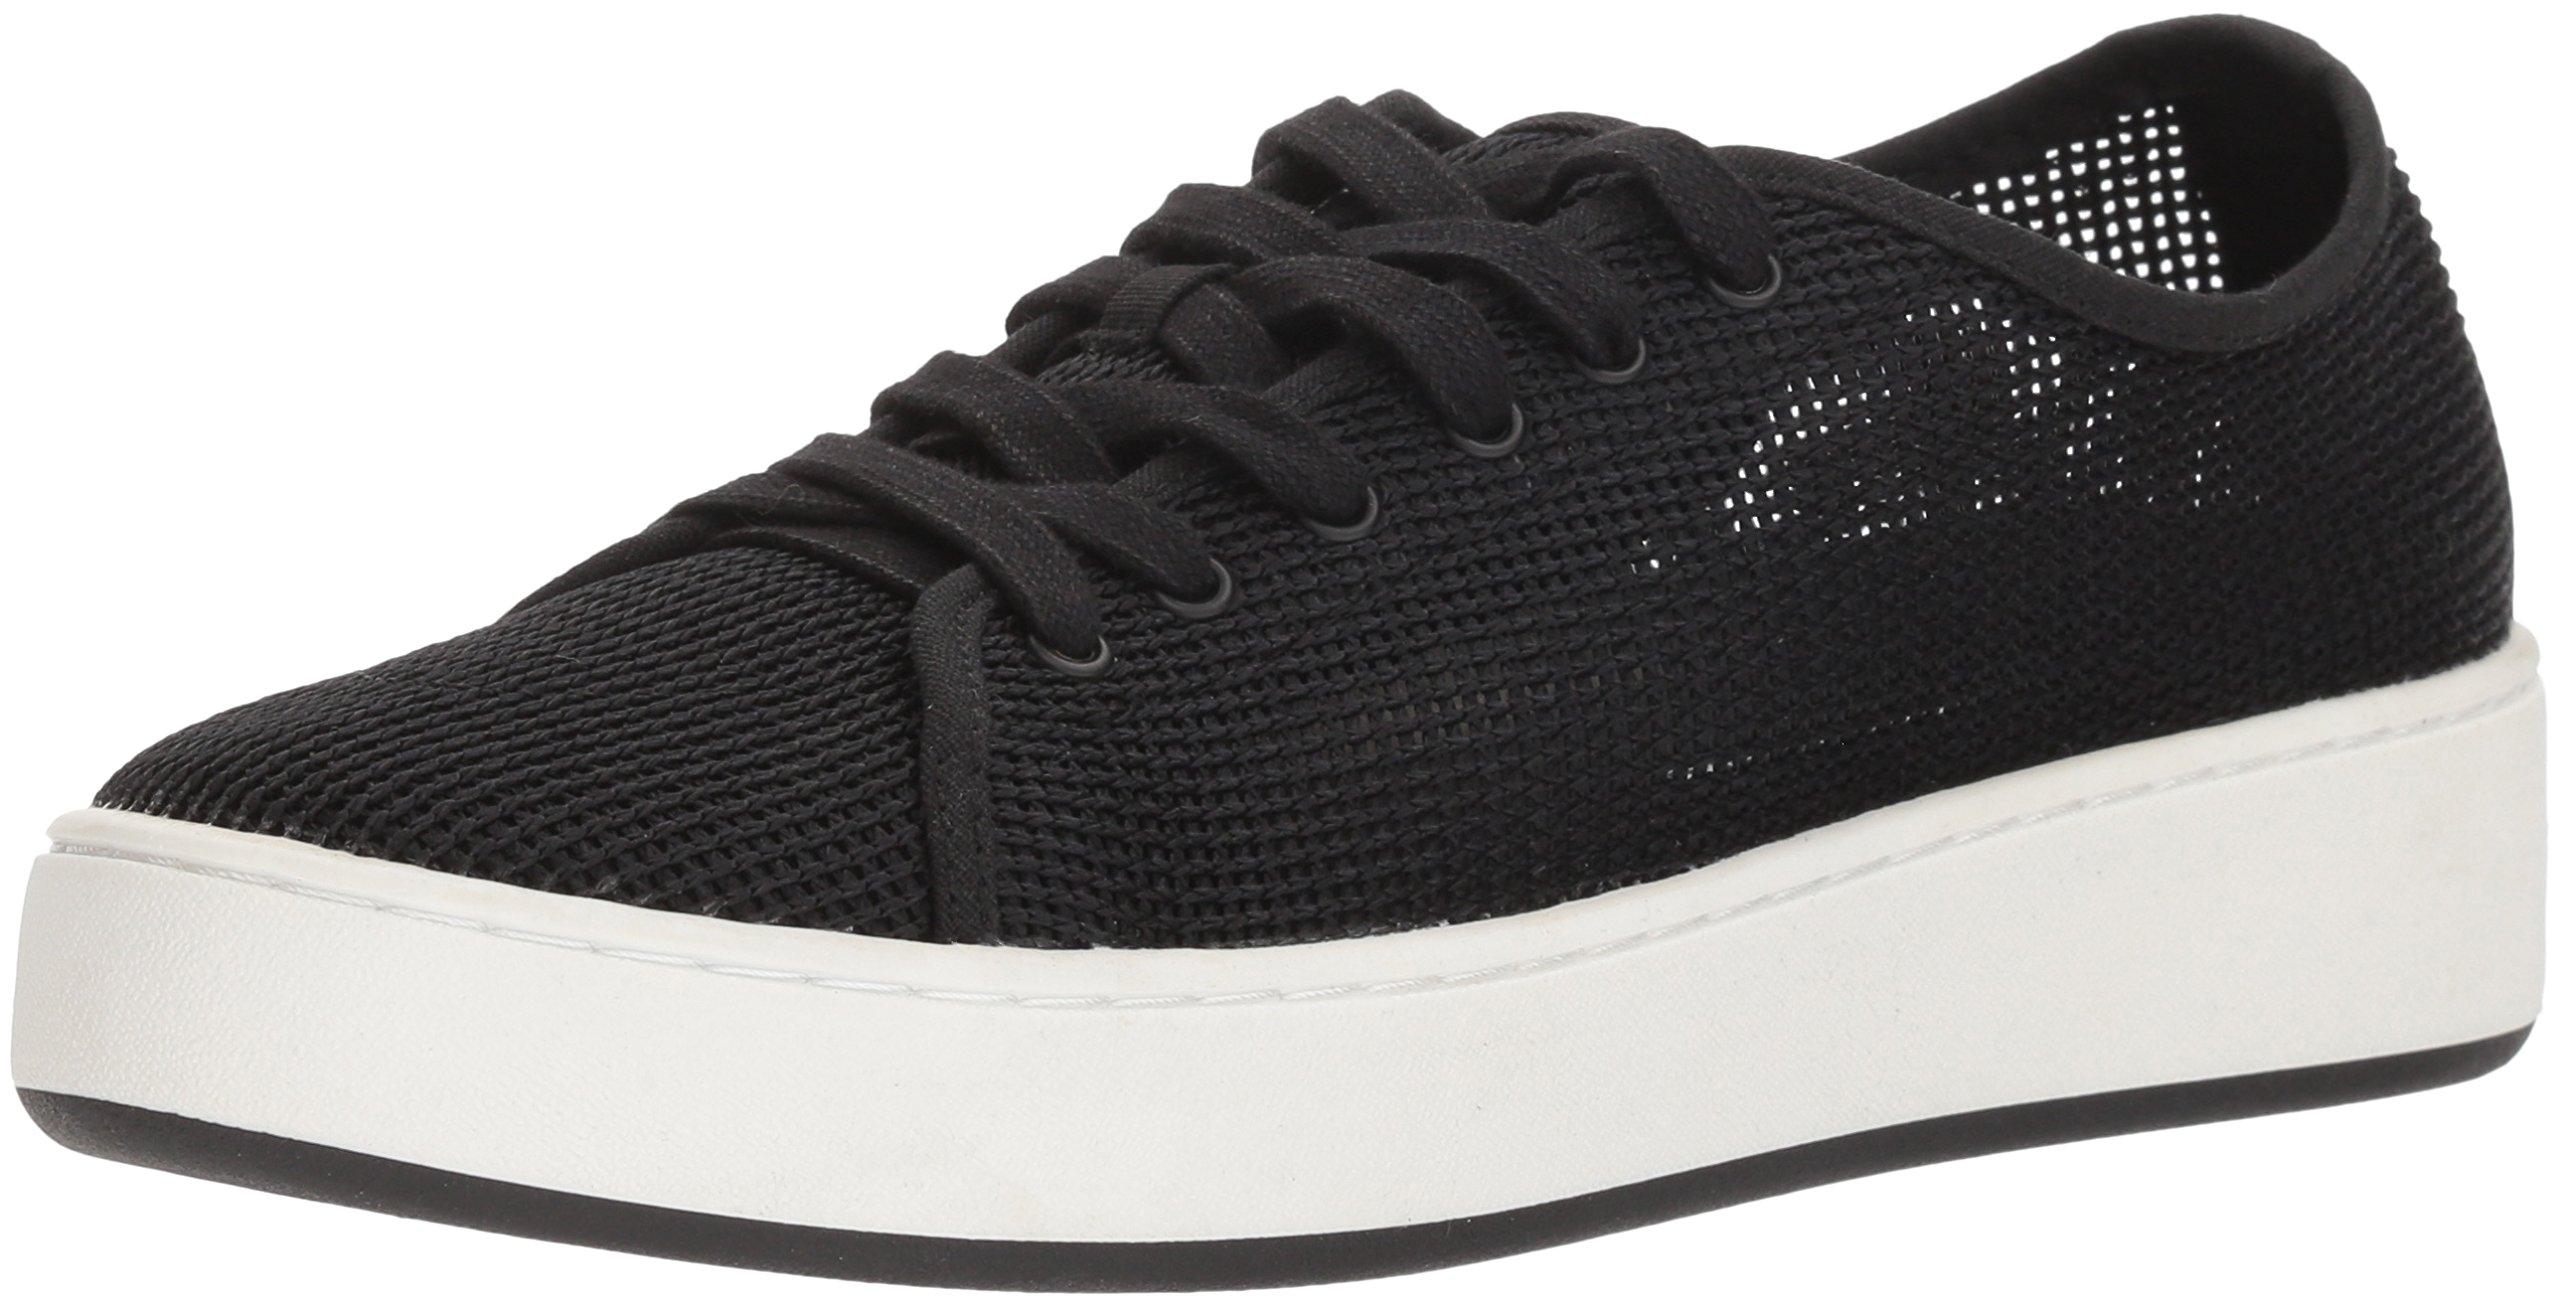 Donald J Pliner Women's Cecile Sneaker, Black, 8.5 Medium US